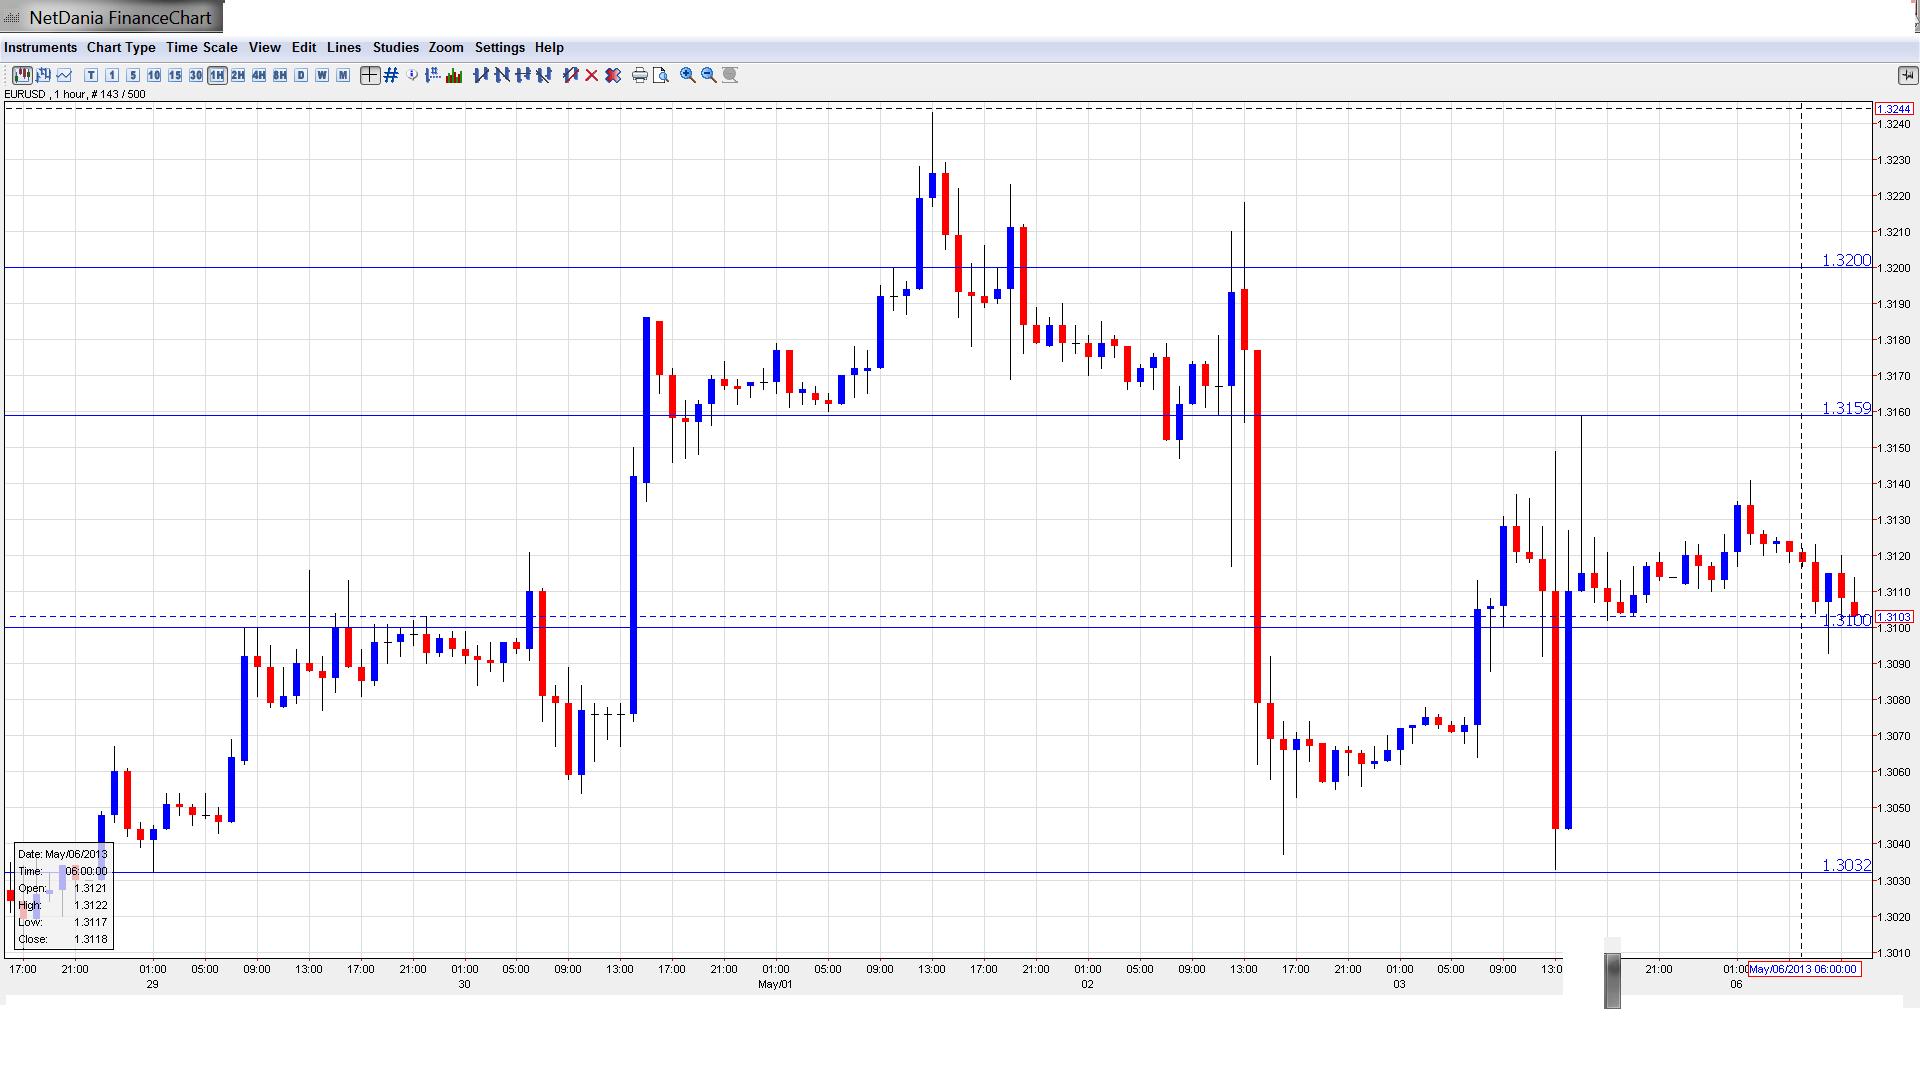 2017 FORECAST FOR EUR/USD